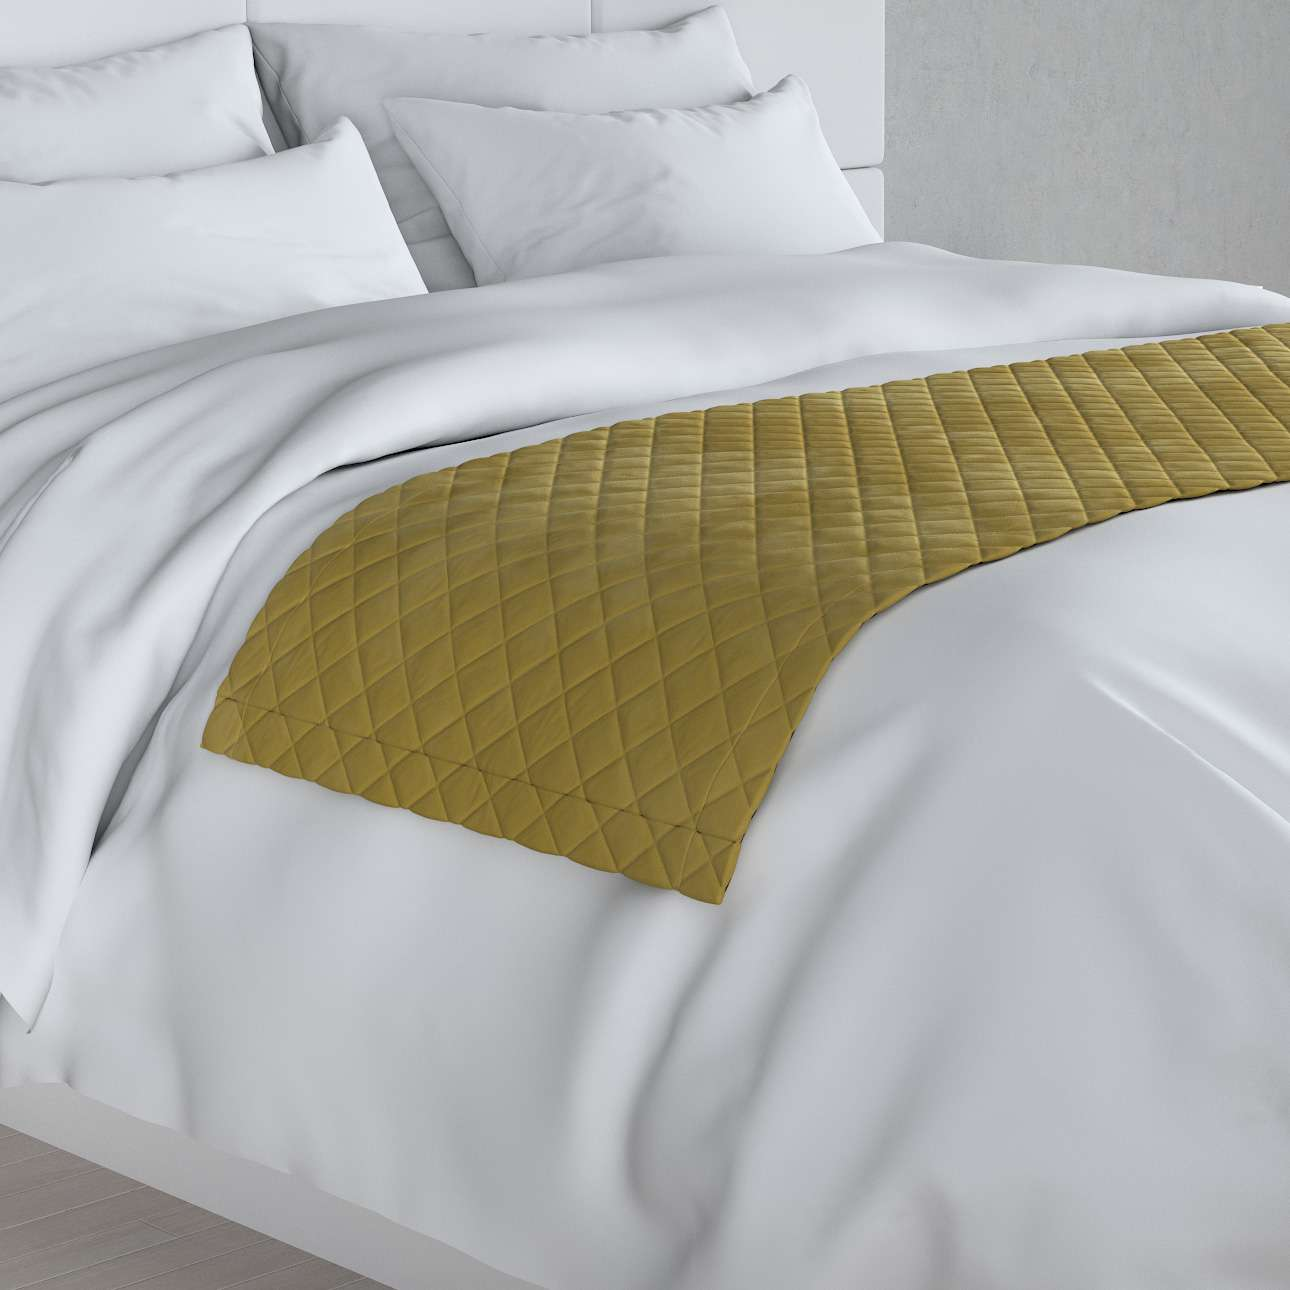 Narzuta hotelowa bieżnik Velvet 60x200cm w kolekcji Velvet, tkanina: 704-27